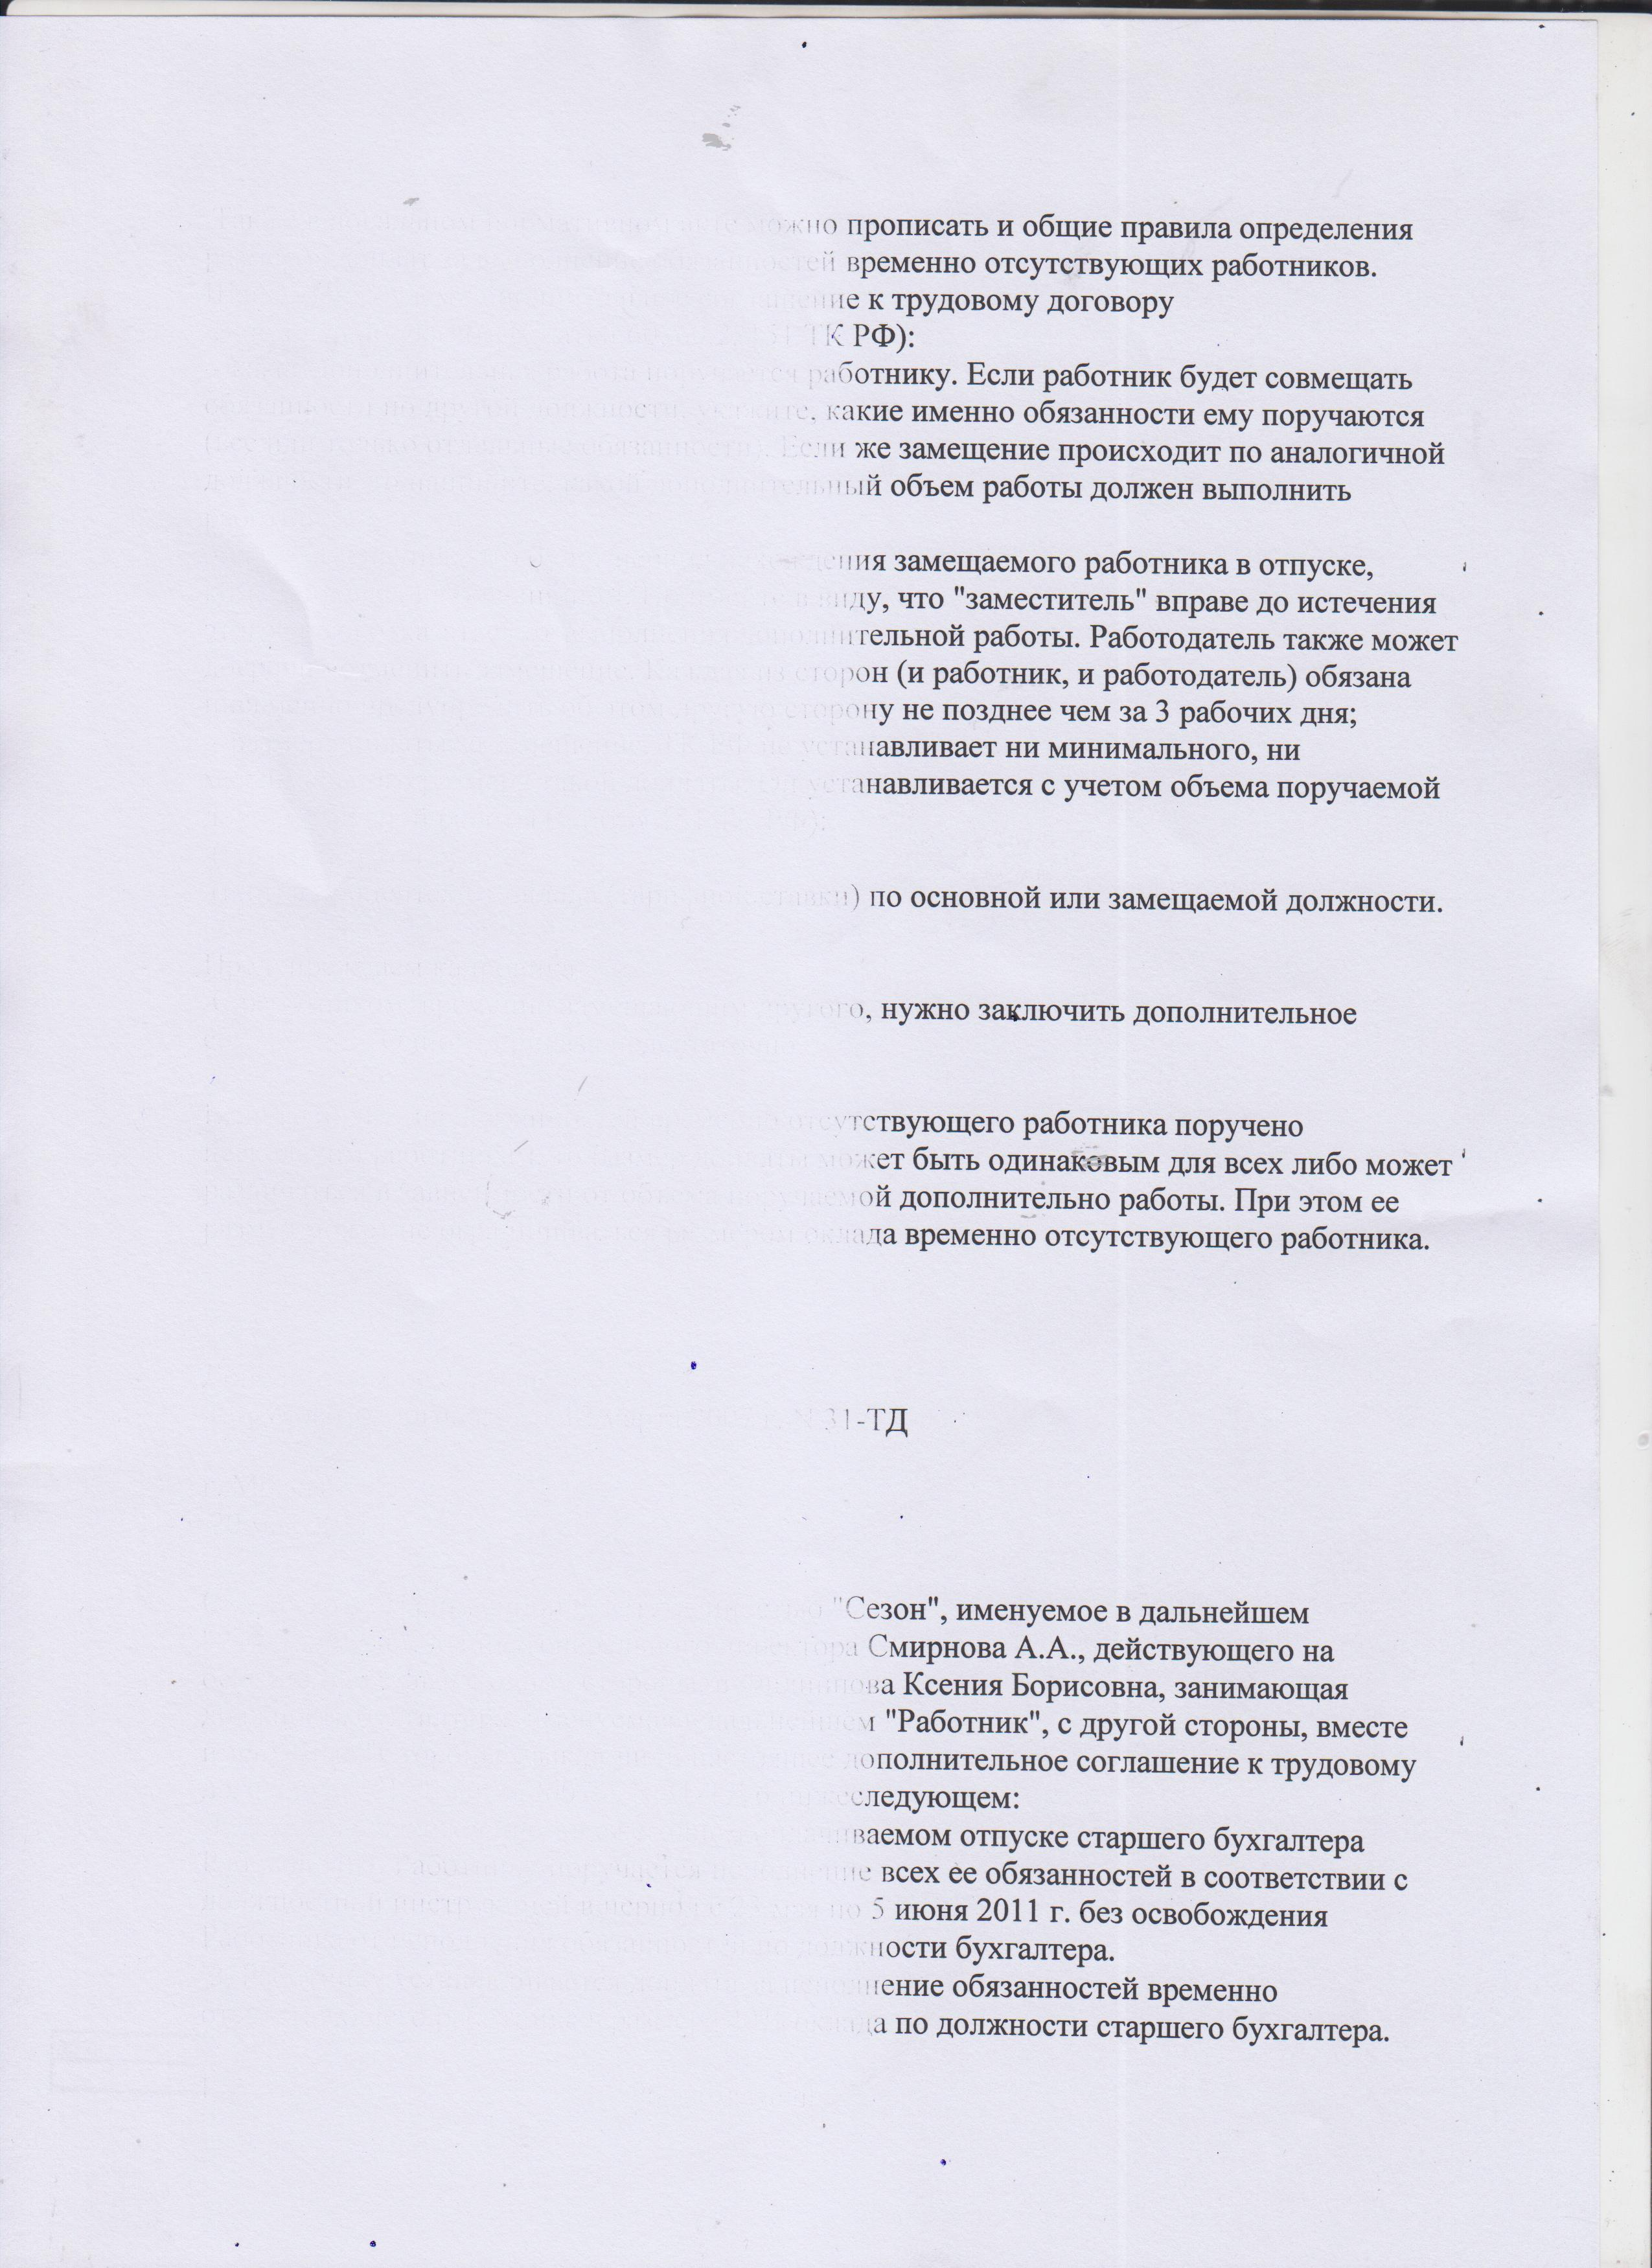 The HP LaserJet M1005 MFP printer prints only a page half